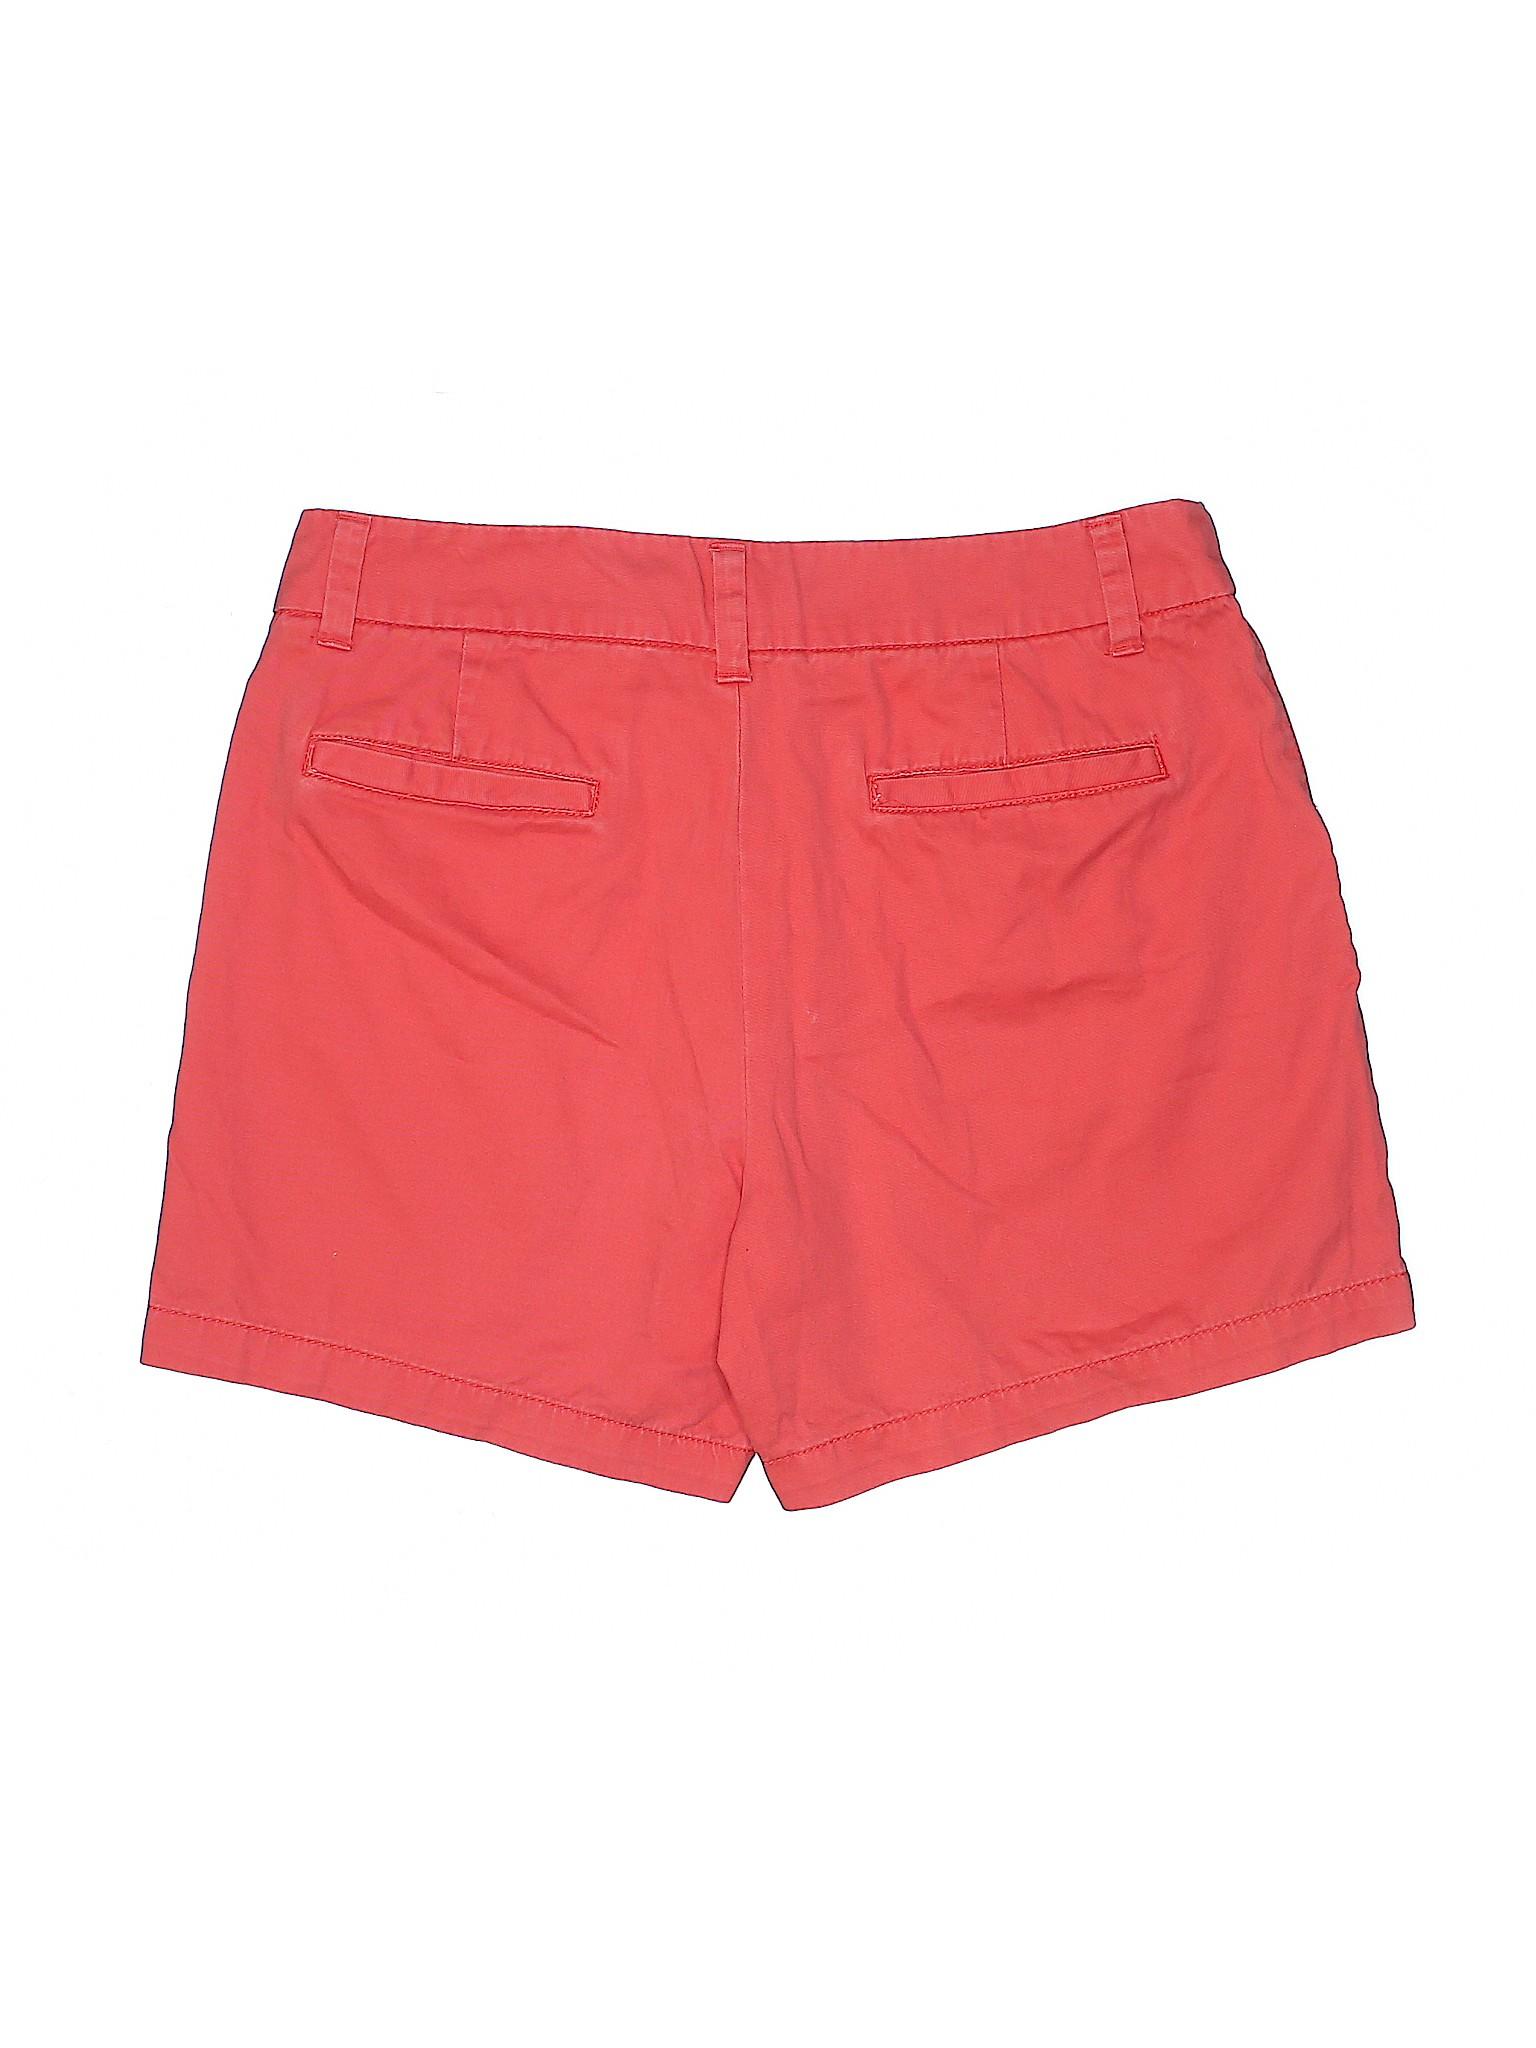 Khaki Merona Shorts winter Shorts Boutique Shorts Boutique Khaki Merona winter Khaki winter Merona Boutique 57pxFwx